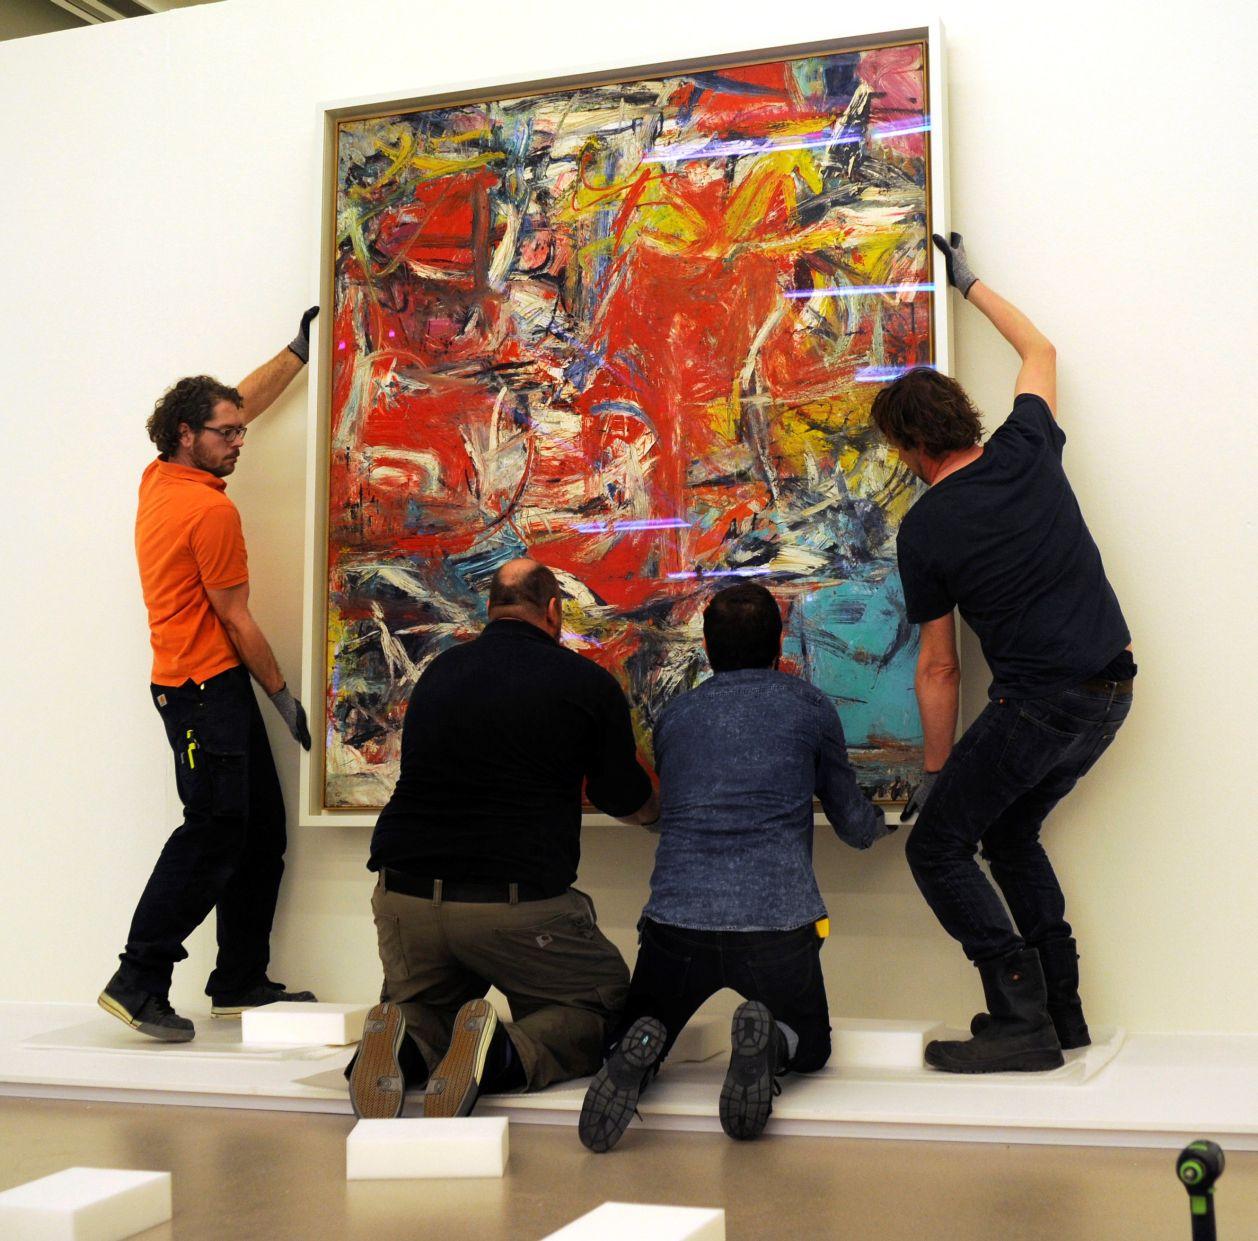 Guggenheim_im_CoBrA_Willem_de_Kooning_Composition_1955__c__2014_Cobra_Museum_of_Modern_Art_Amstelveen_s